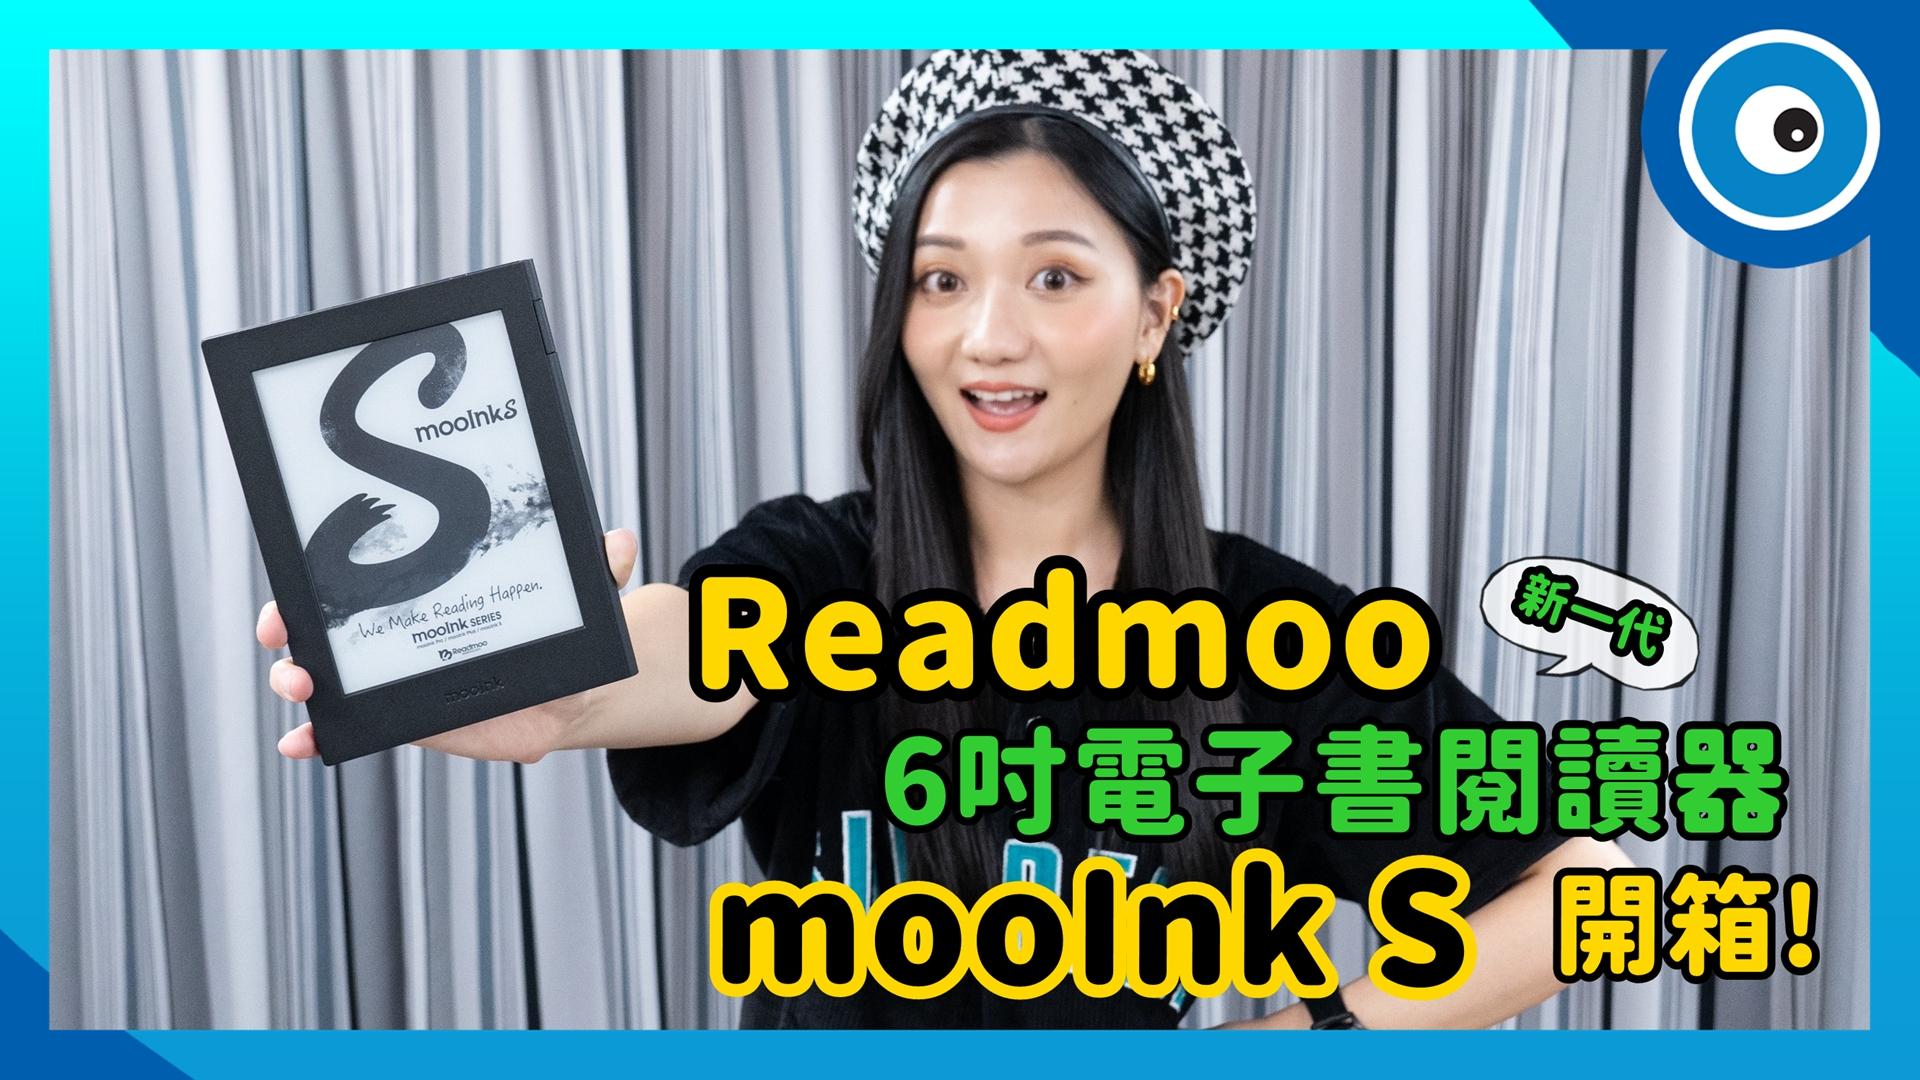 Readmoo 讀墨今年推出了新一代 mooInk S 6 吋電子書閱讀器,今天就來簡單開箱介紹這款產品,同時也一併分享這段時間的使用心得!